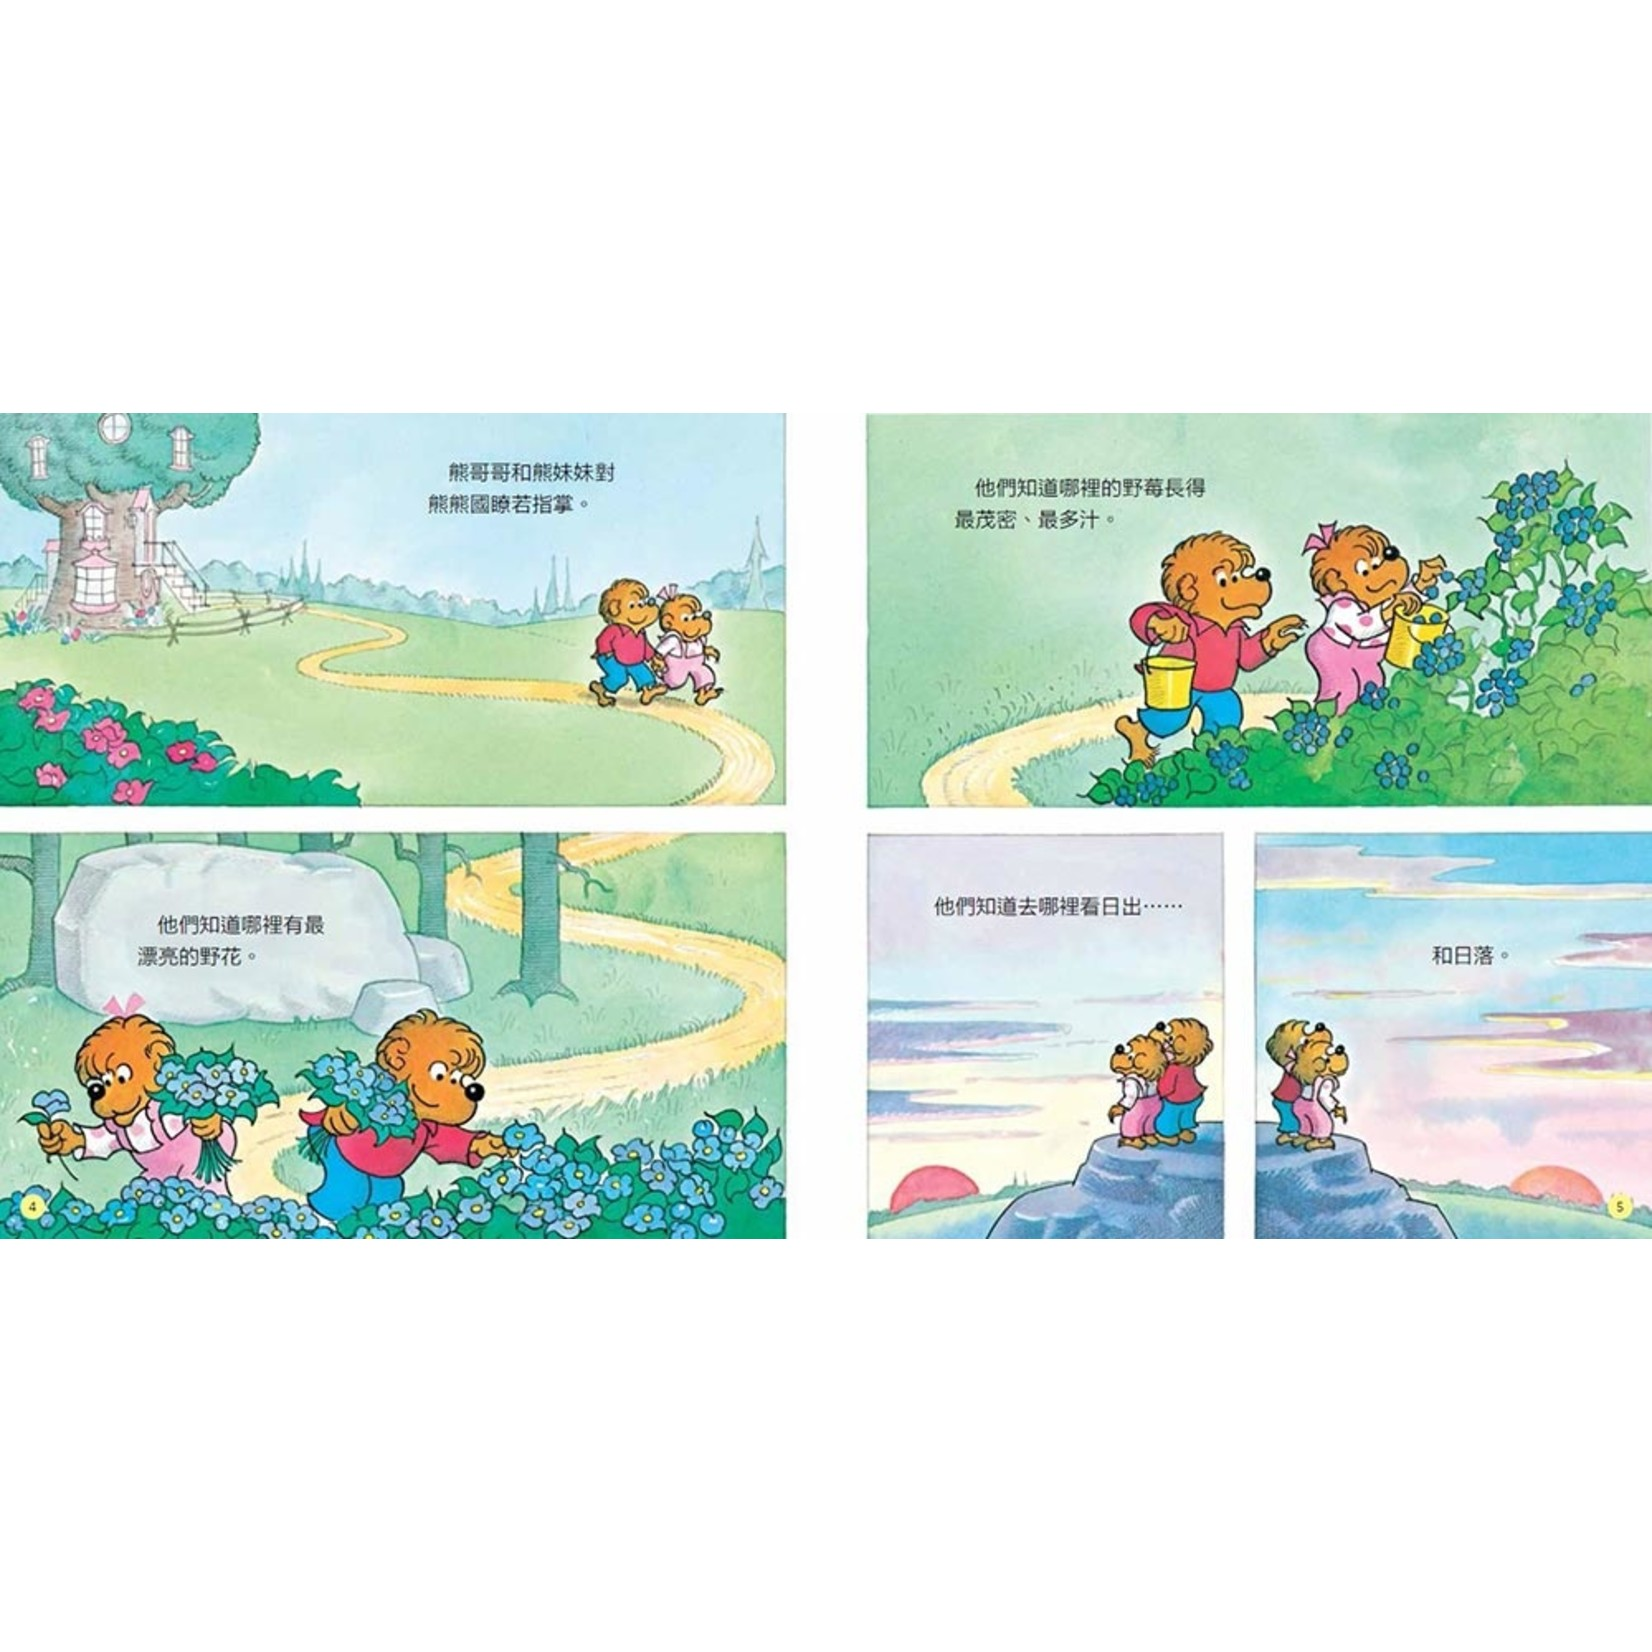 生命樹 Life Tree Global 貝安斯坦熊系列08:錢該怎樣用 The Berenstain Bears 08: Trouble With Money